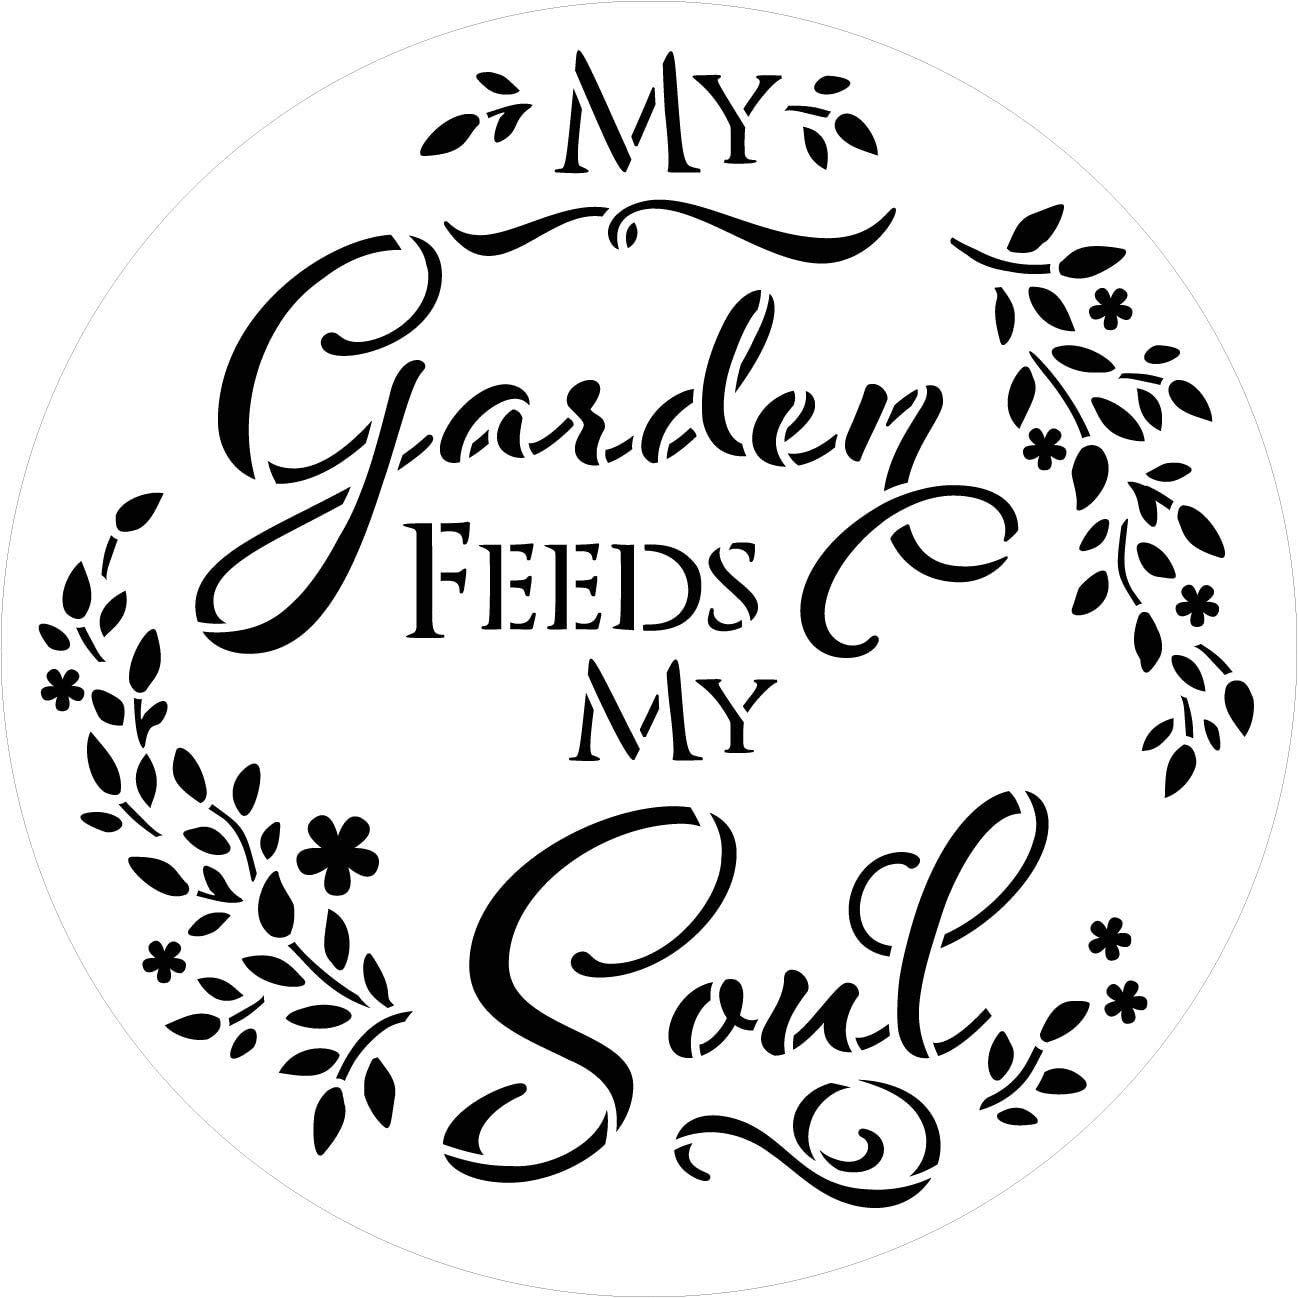 Garden Feeds My Soul Stencil by StudioR12   Reusable Round Mylar Template Paint Wood Sign   Flower Laurel Wreath   Craft DIY Home Decor Cursive Script Gift - Porch Select Size